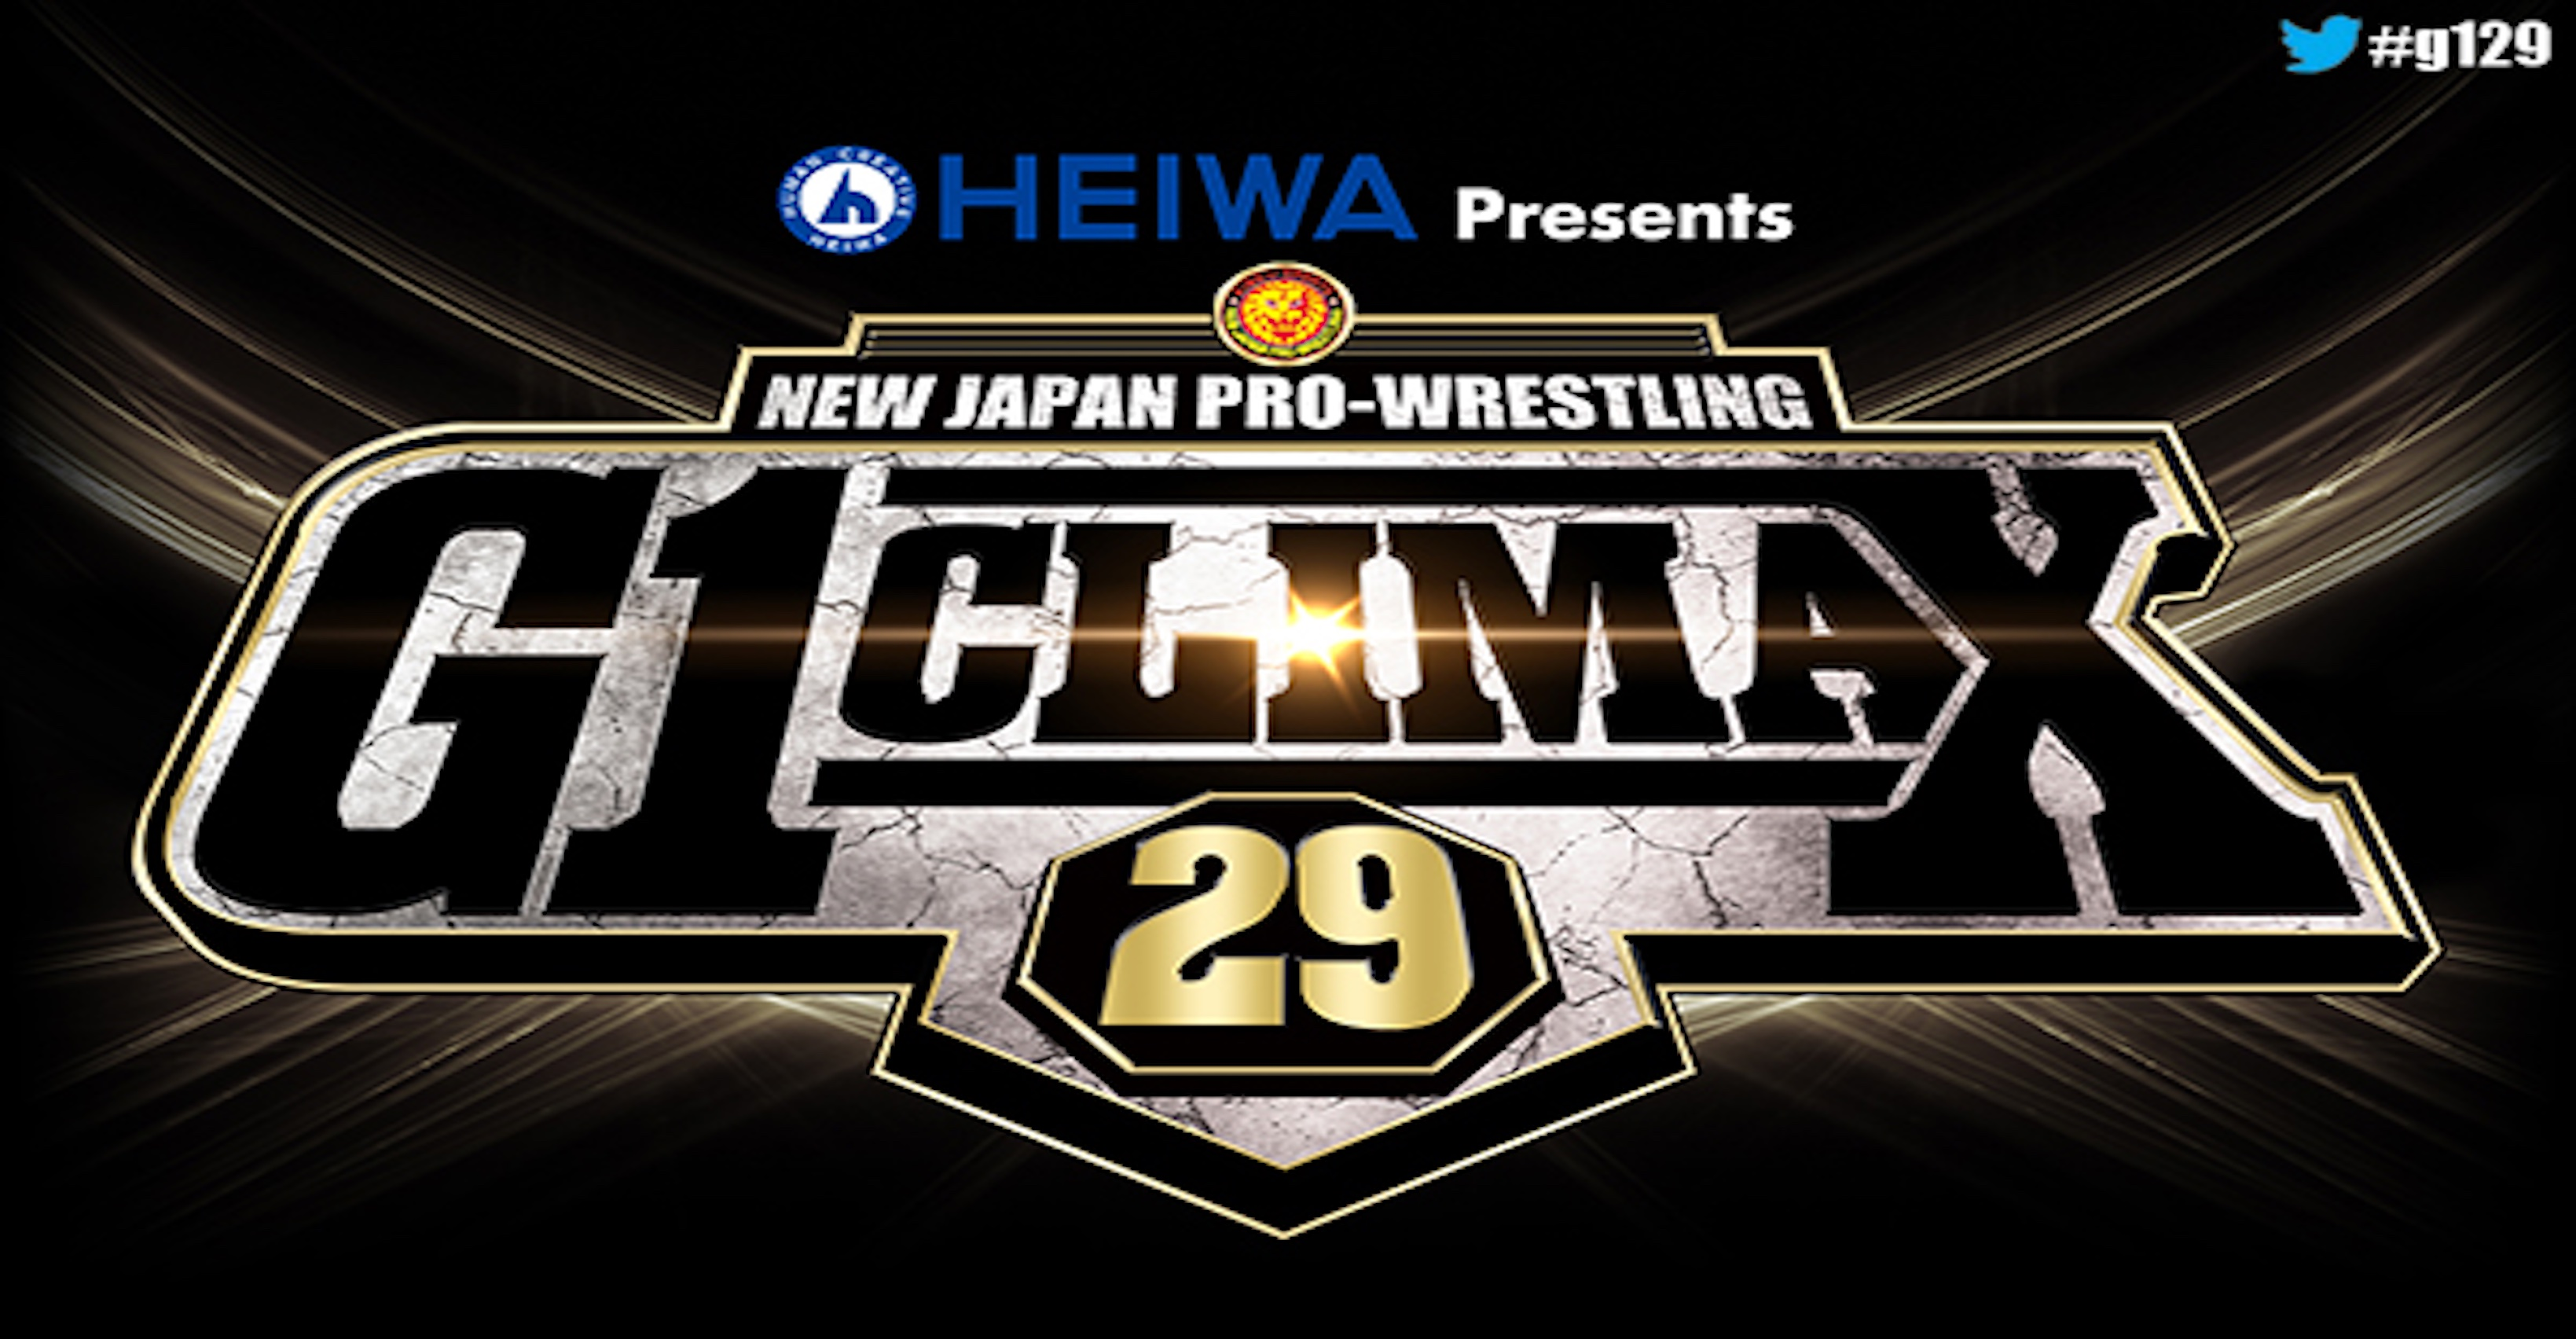 NJPW's 'G1 Climax' Results: Okada Vs. Tanahashi, Kenta Vs. Ibushi, More